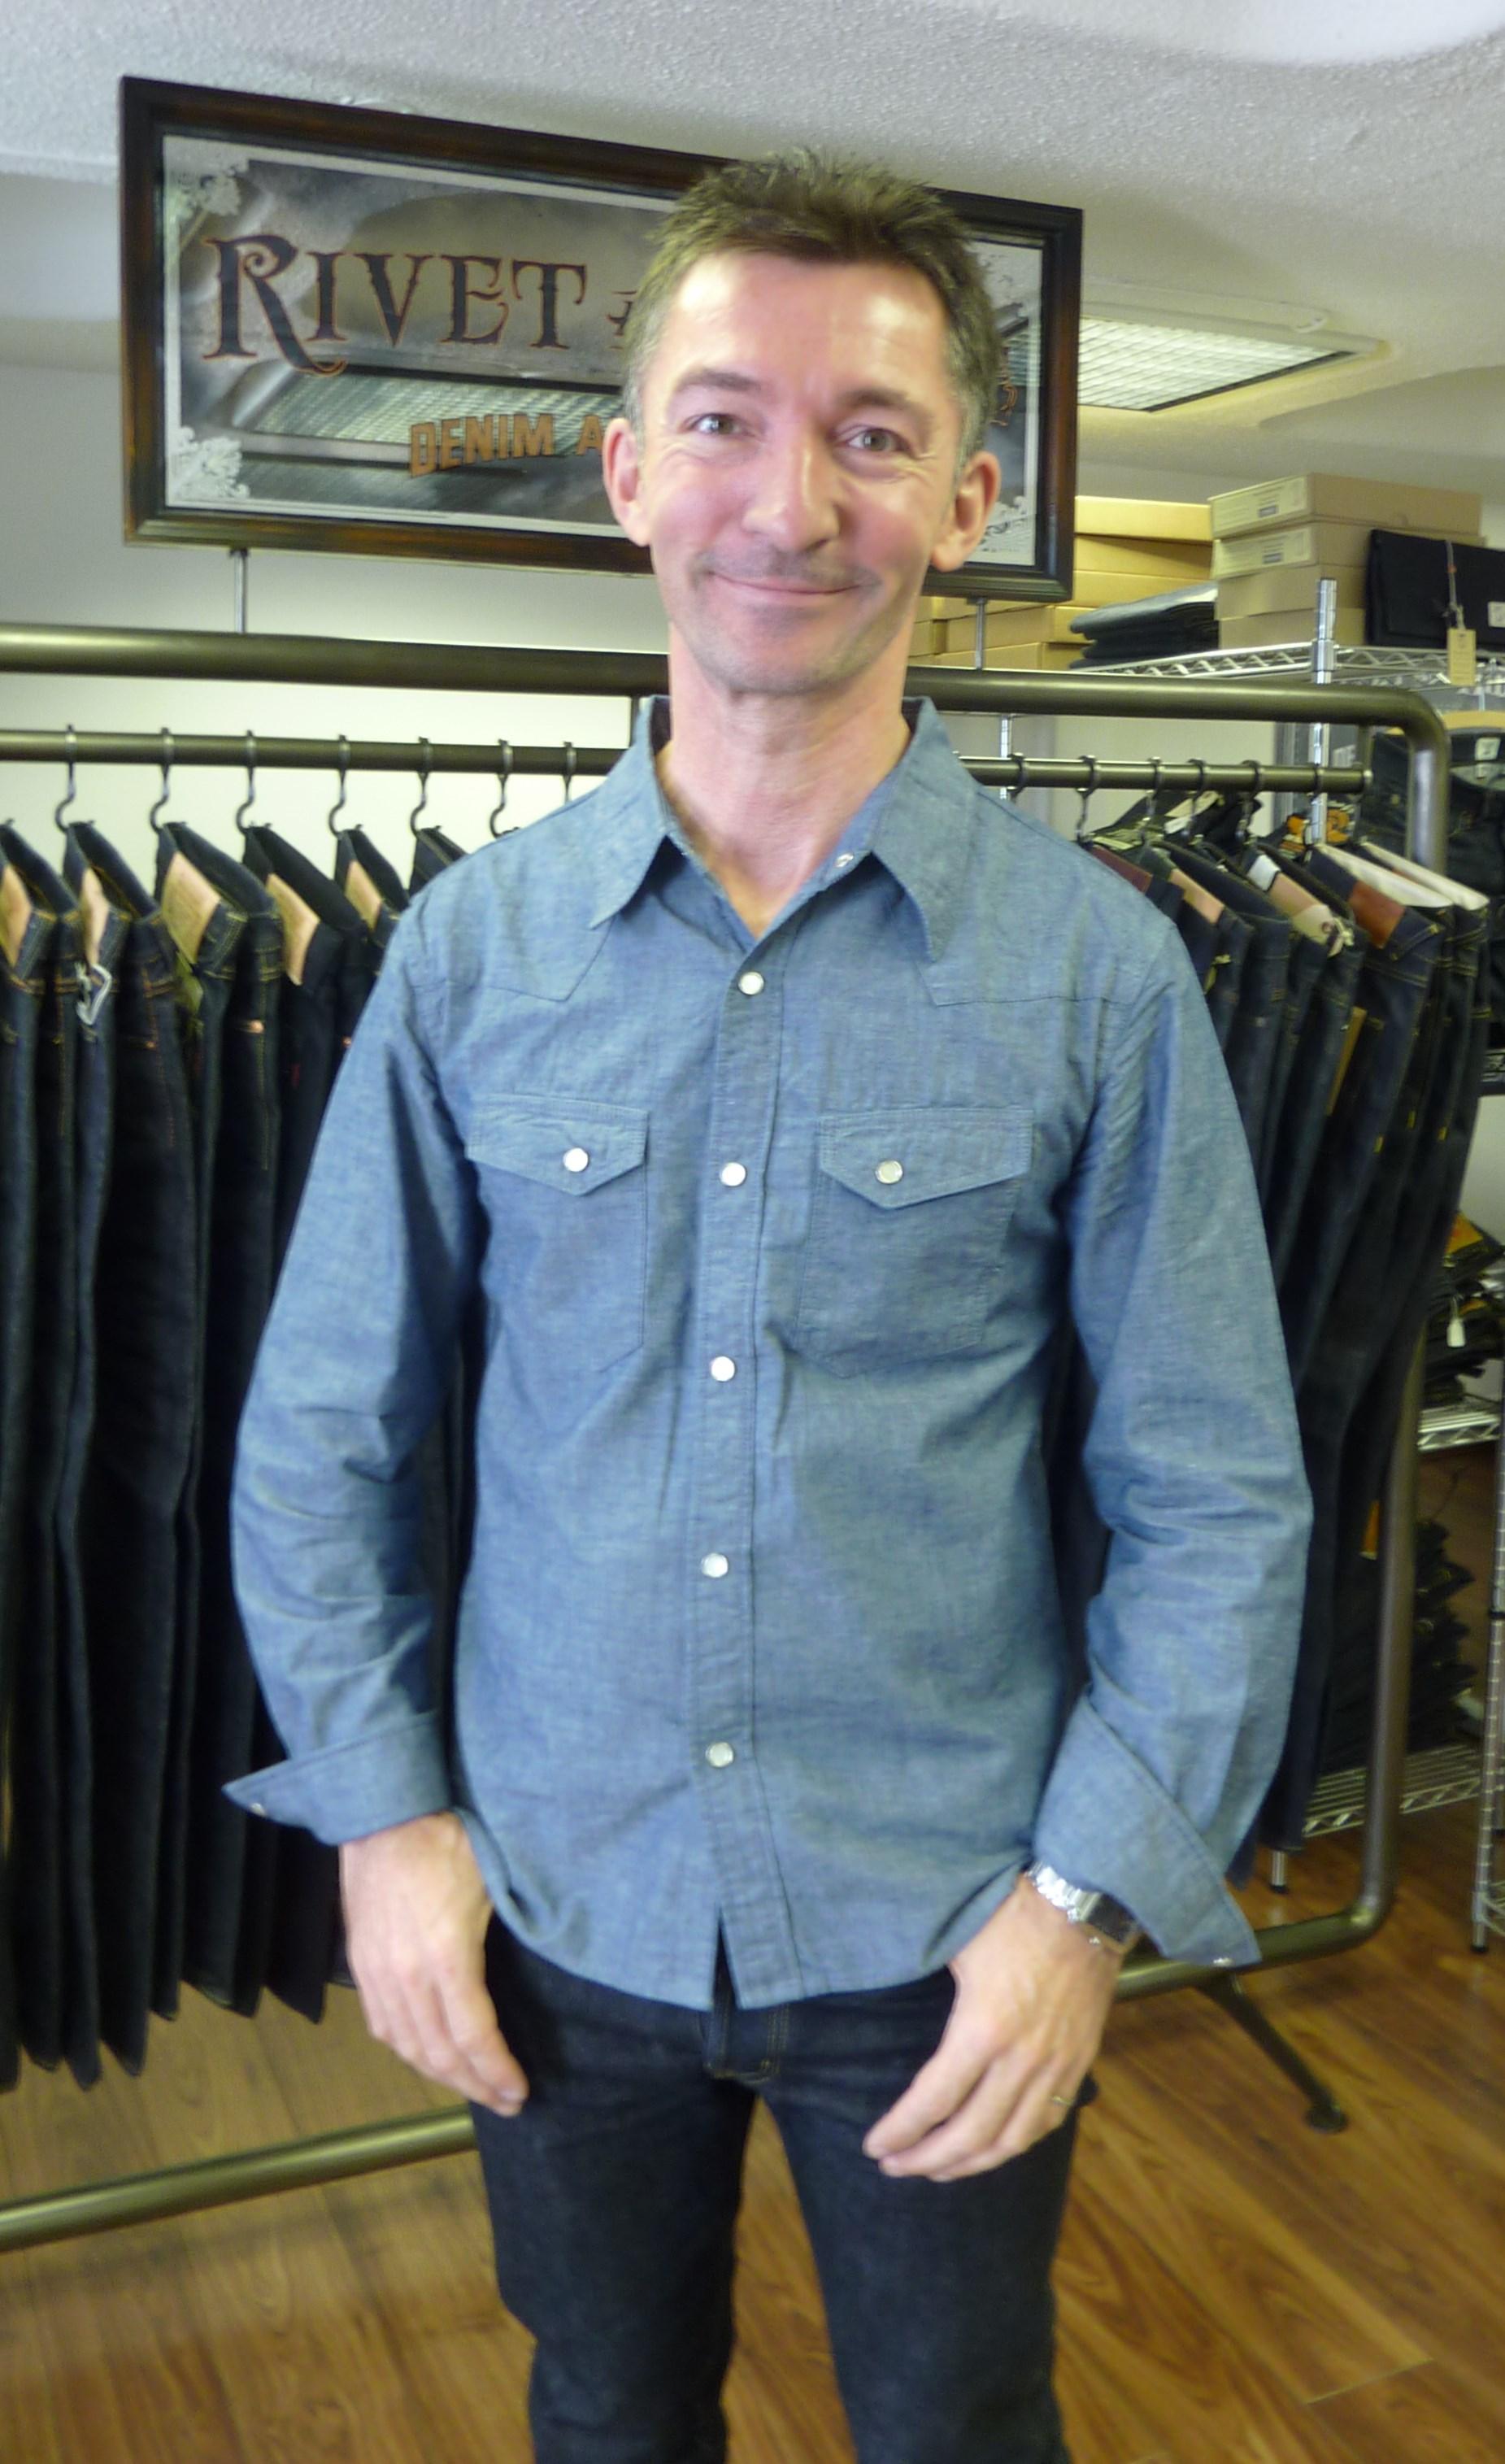 Smog Jeans for Men in CR0 London for £20.00 for sale | Shpock